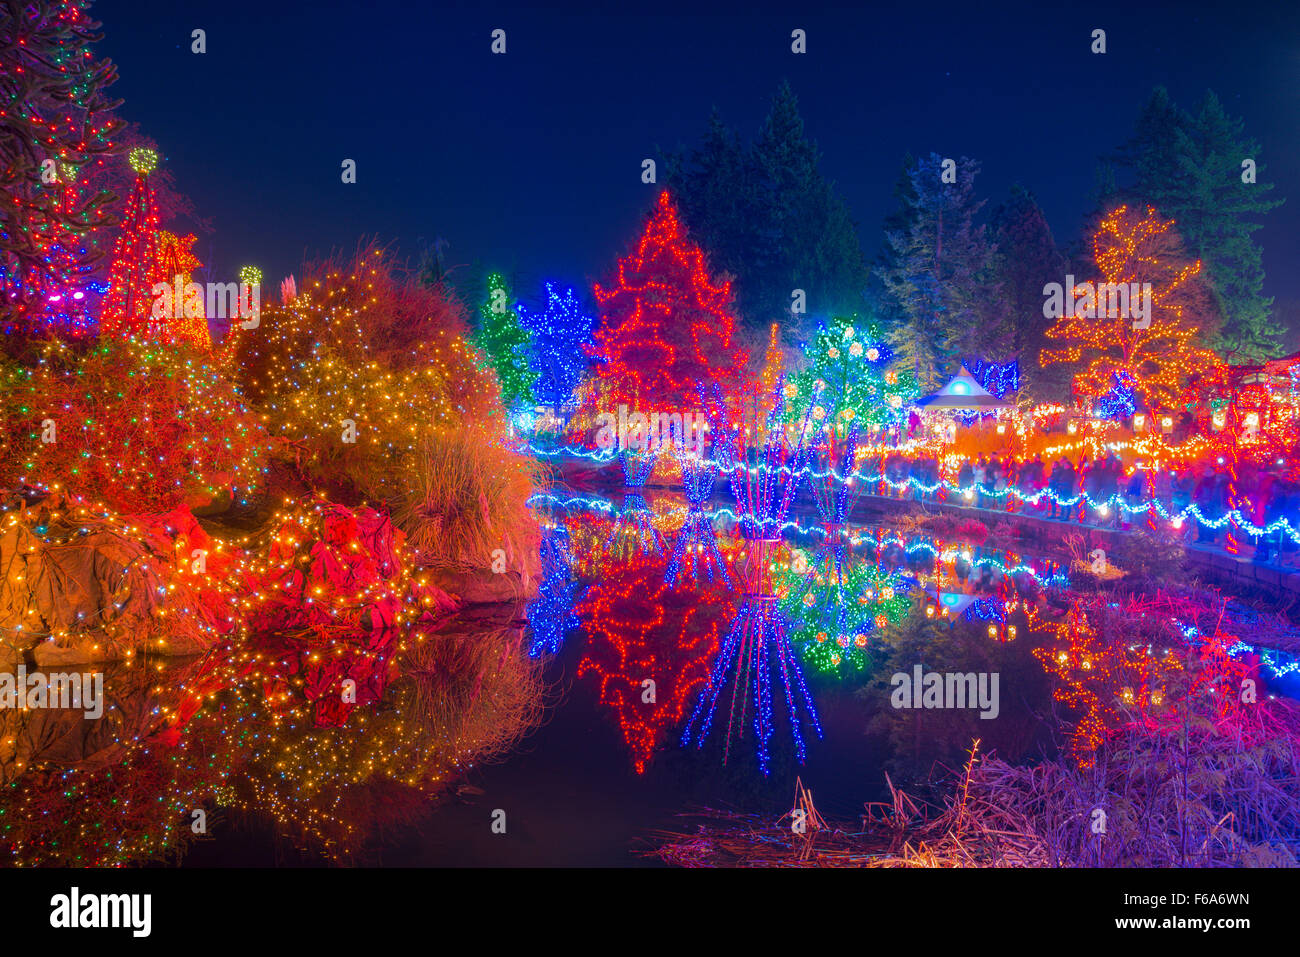 Festival Of Lights, VanDusen Botanical Garden, Vancouver, British Columbia,  Canada